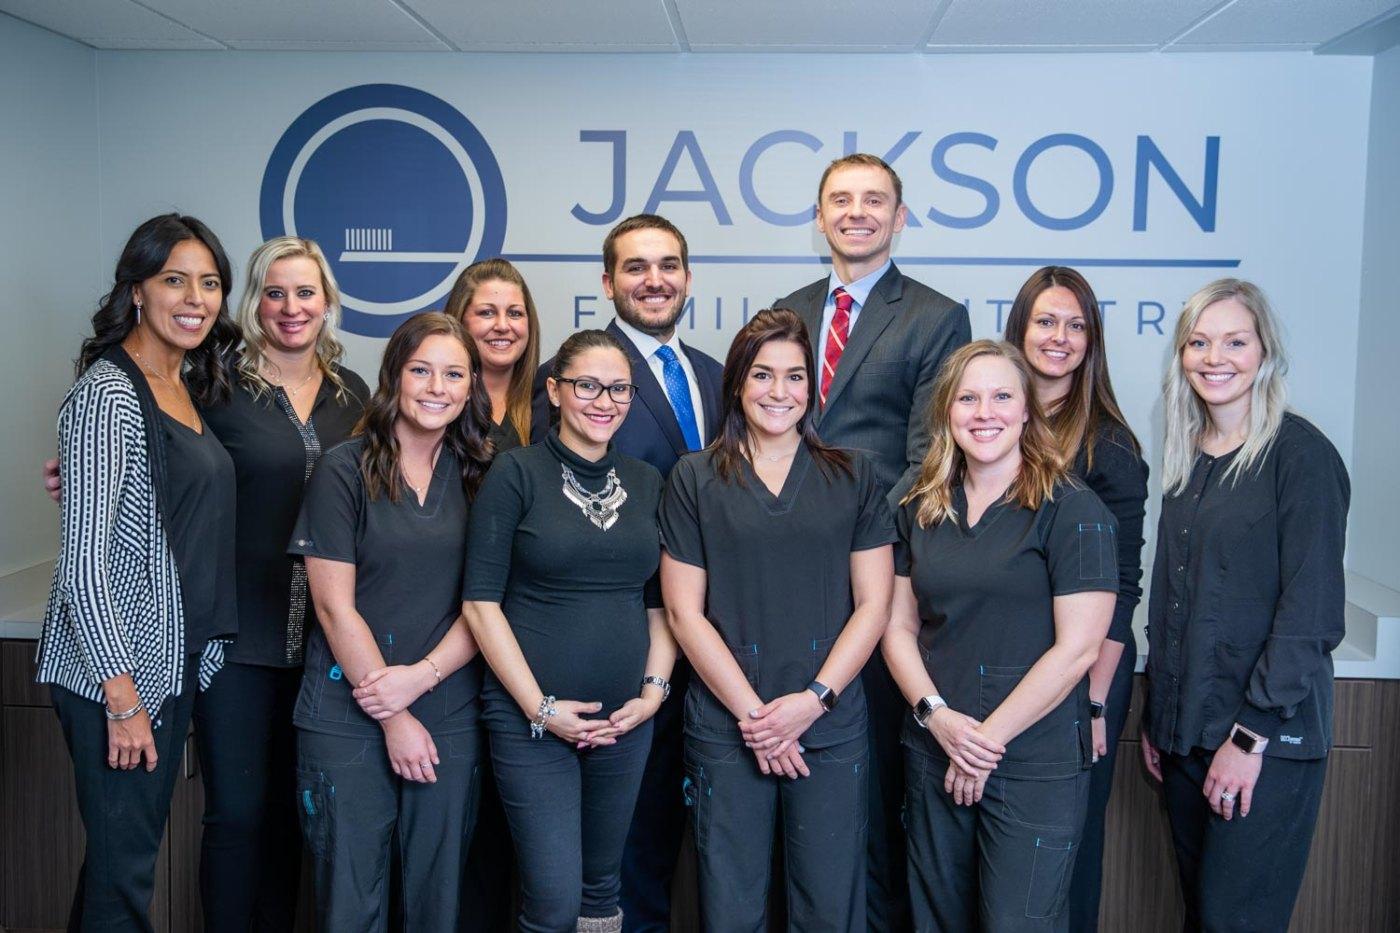 Jackson Family Dentistry Team Photo in the lobby